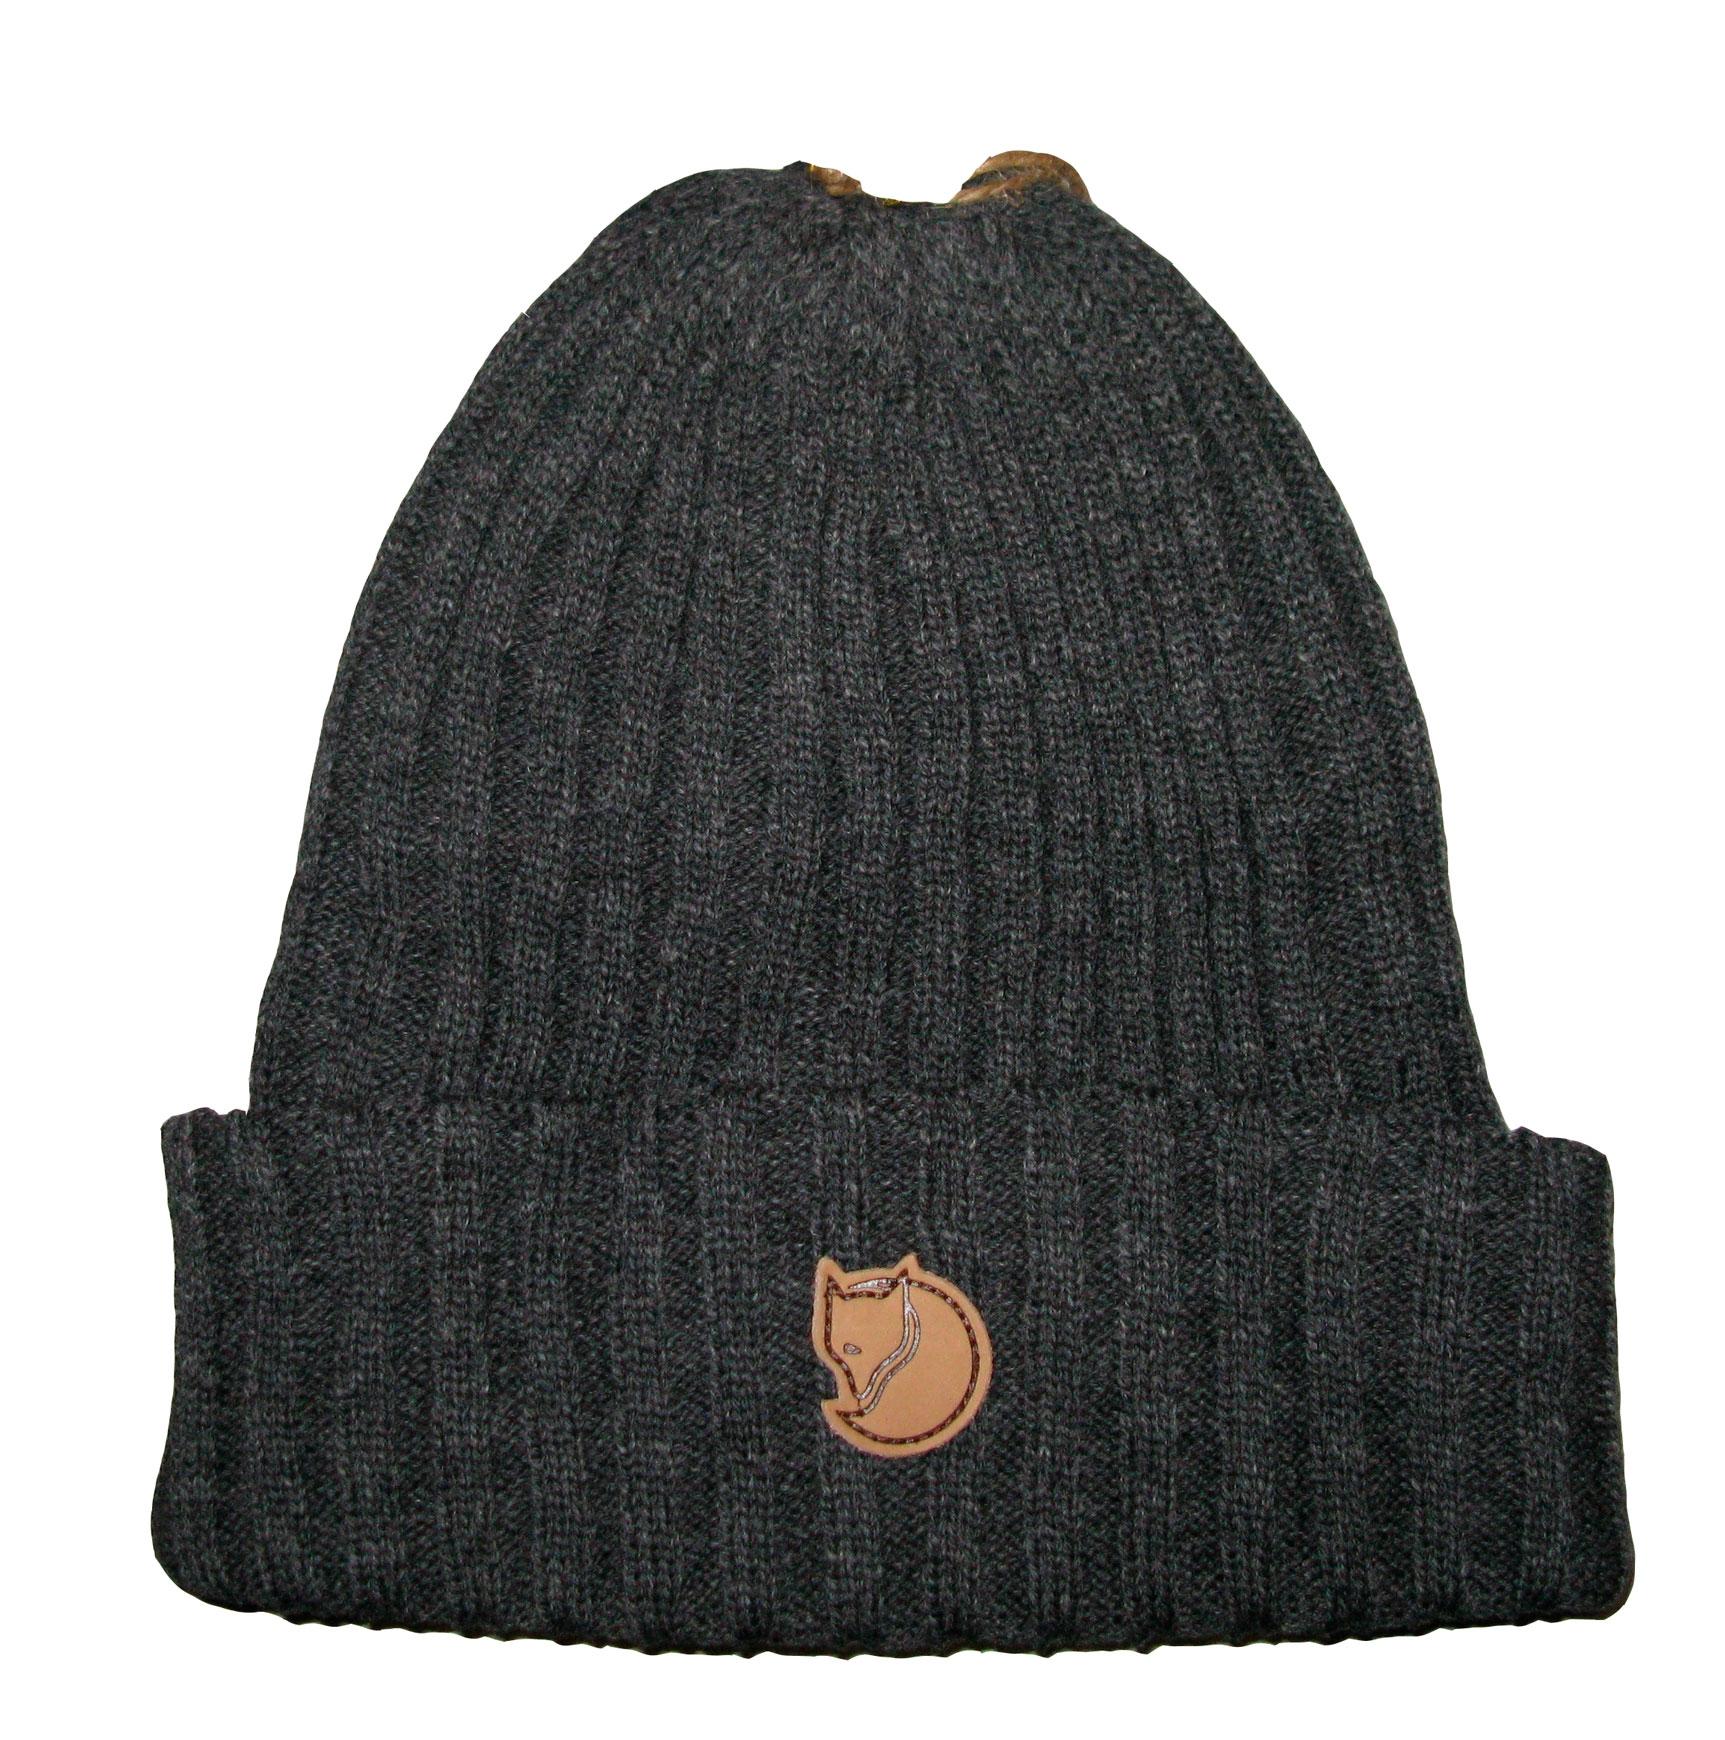 Fjallraven Beanie Olive Autumn Leaf Dark Navy Fjallraven Byron Wooly Hat